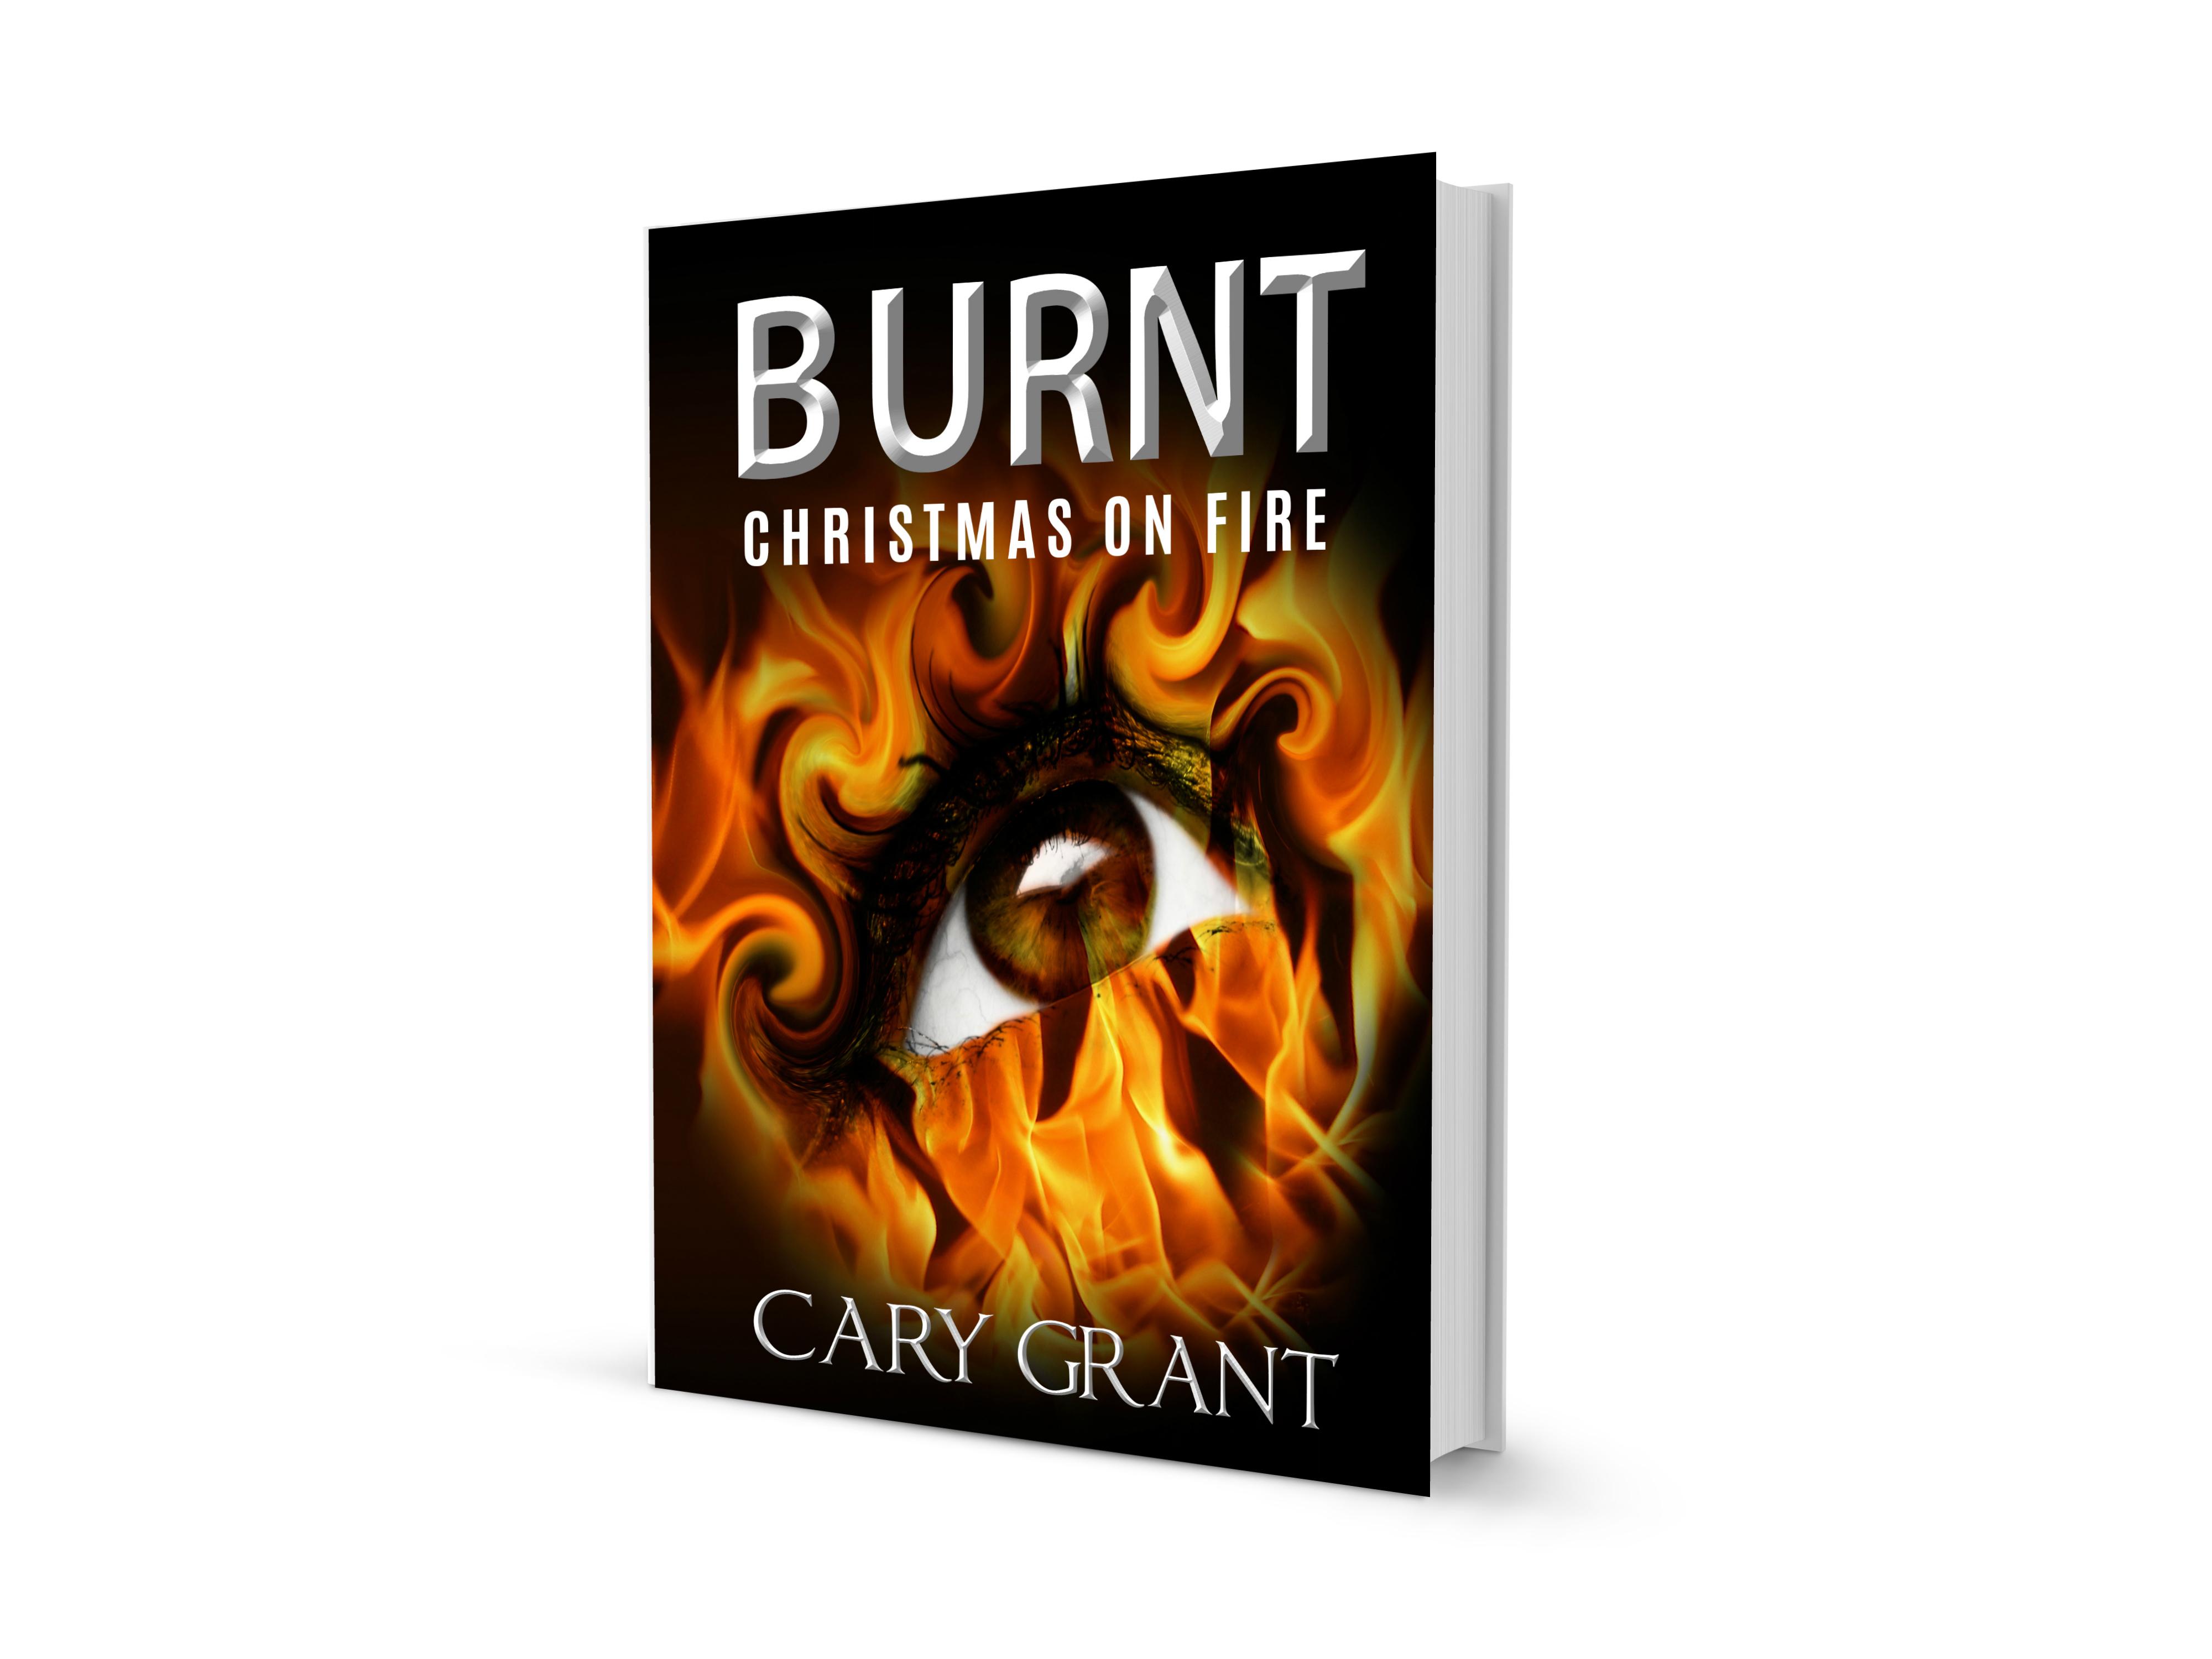 BURNT - Christmas on Fire